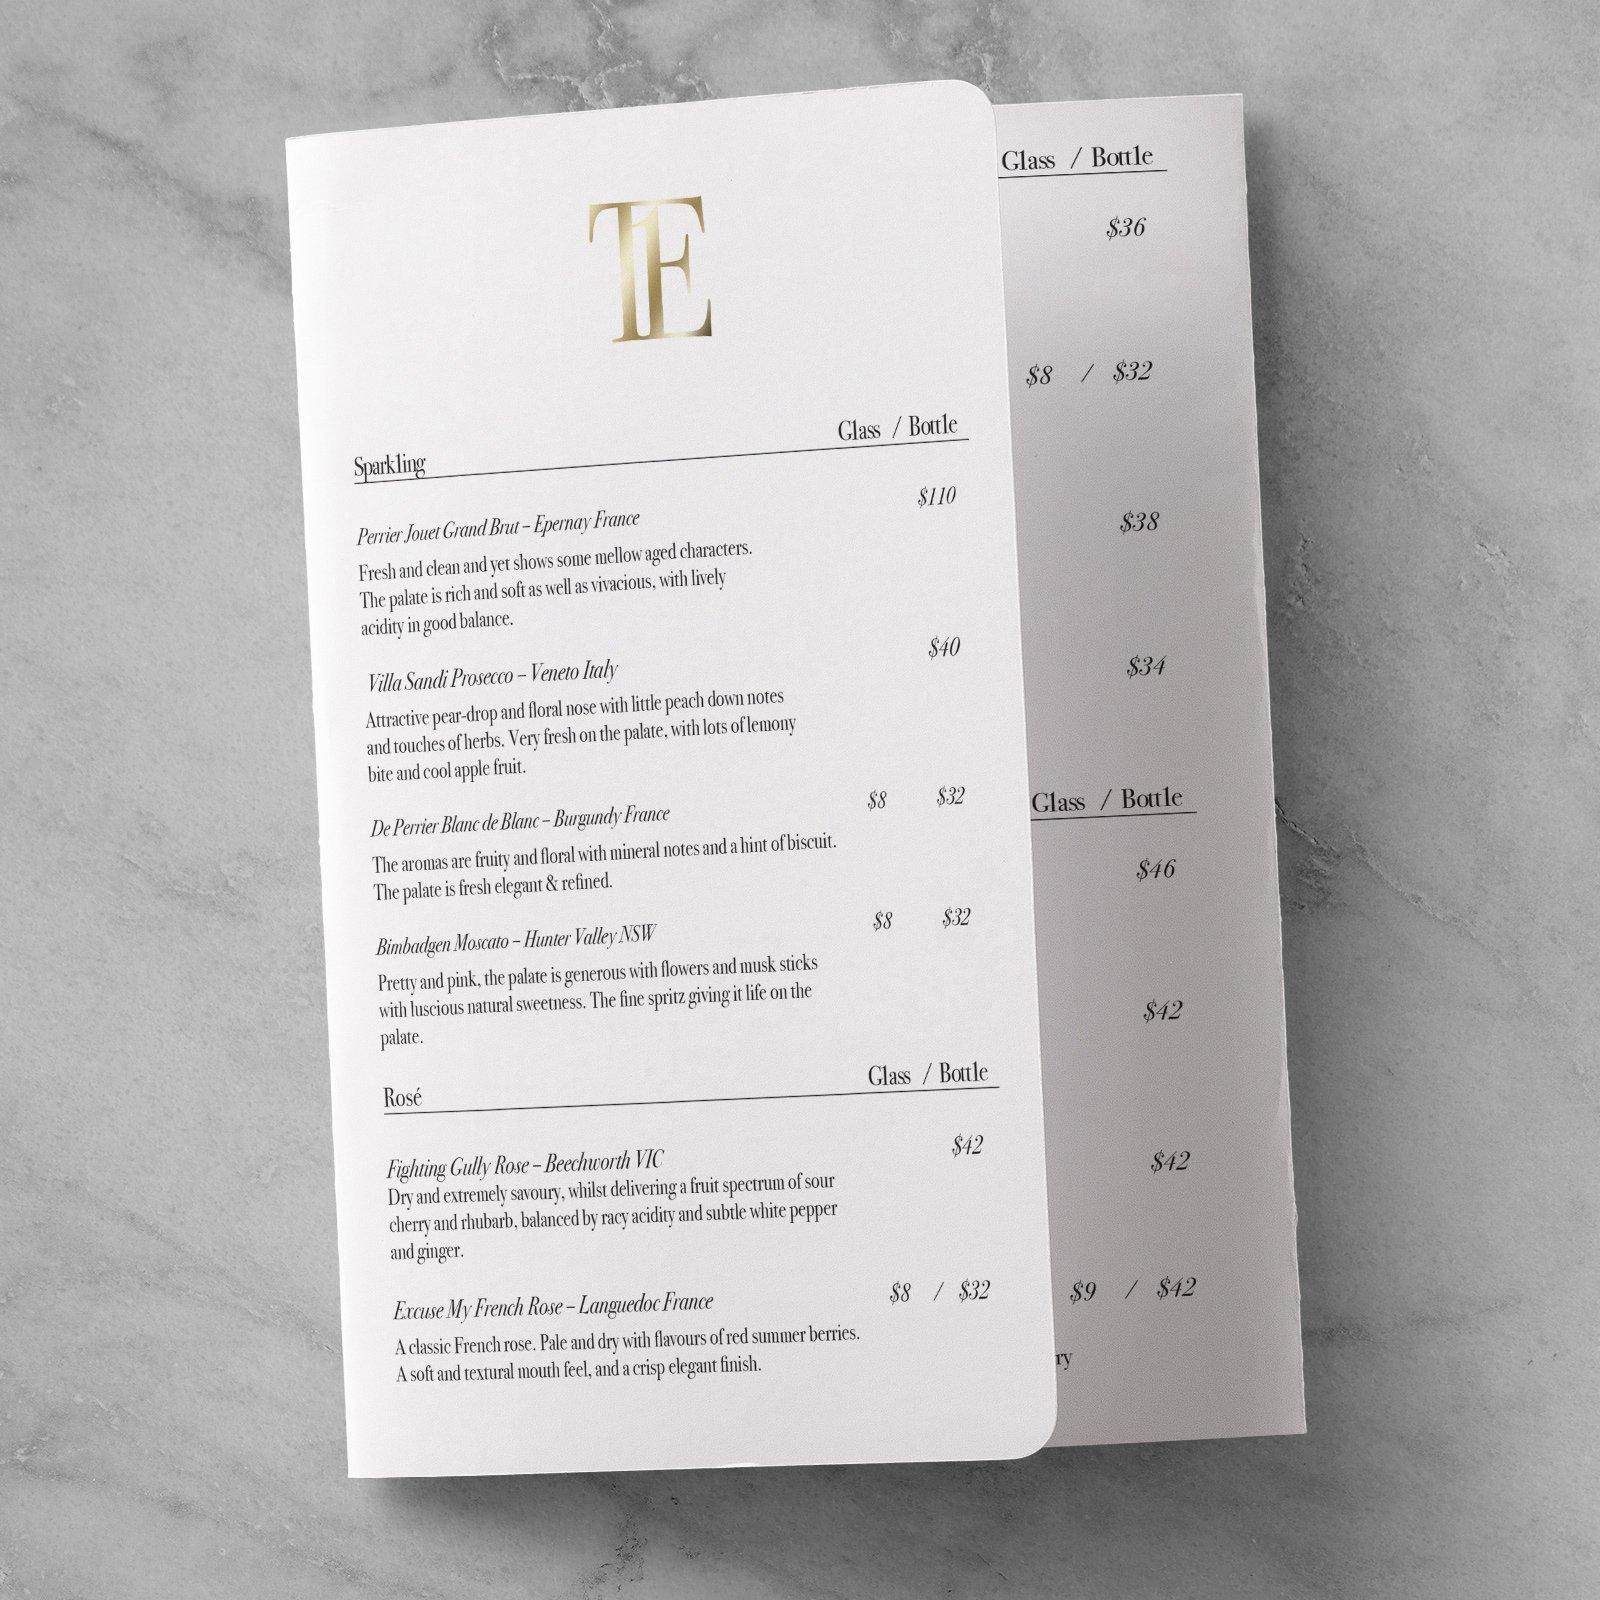 Table 1 Espresso Wine List